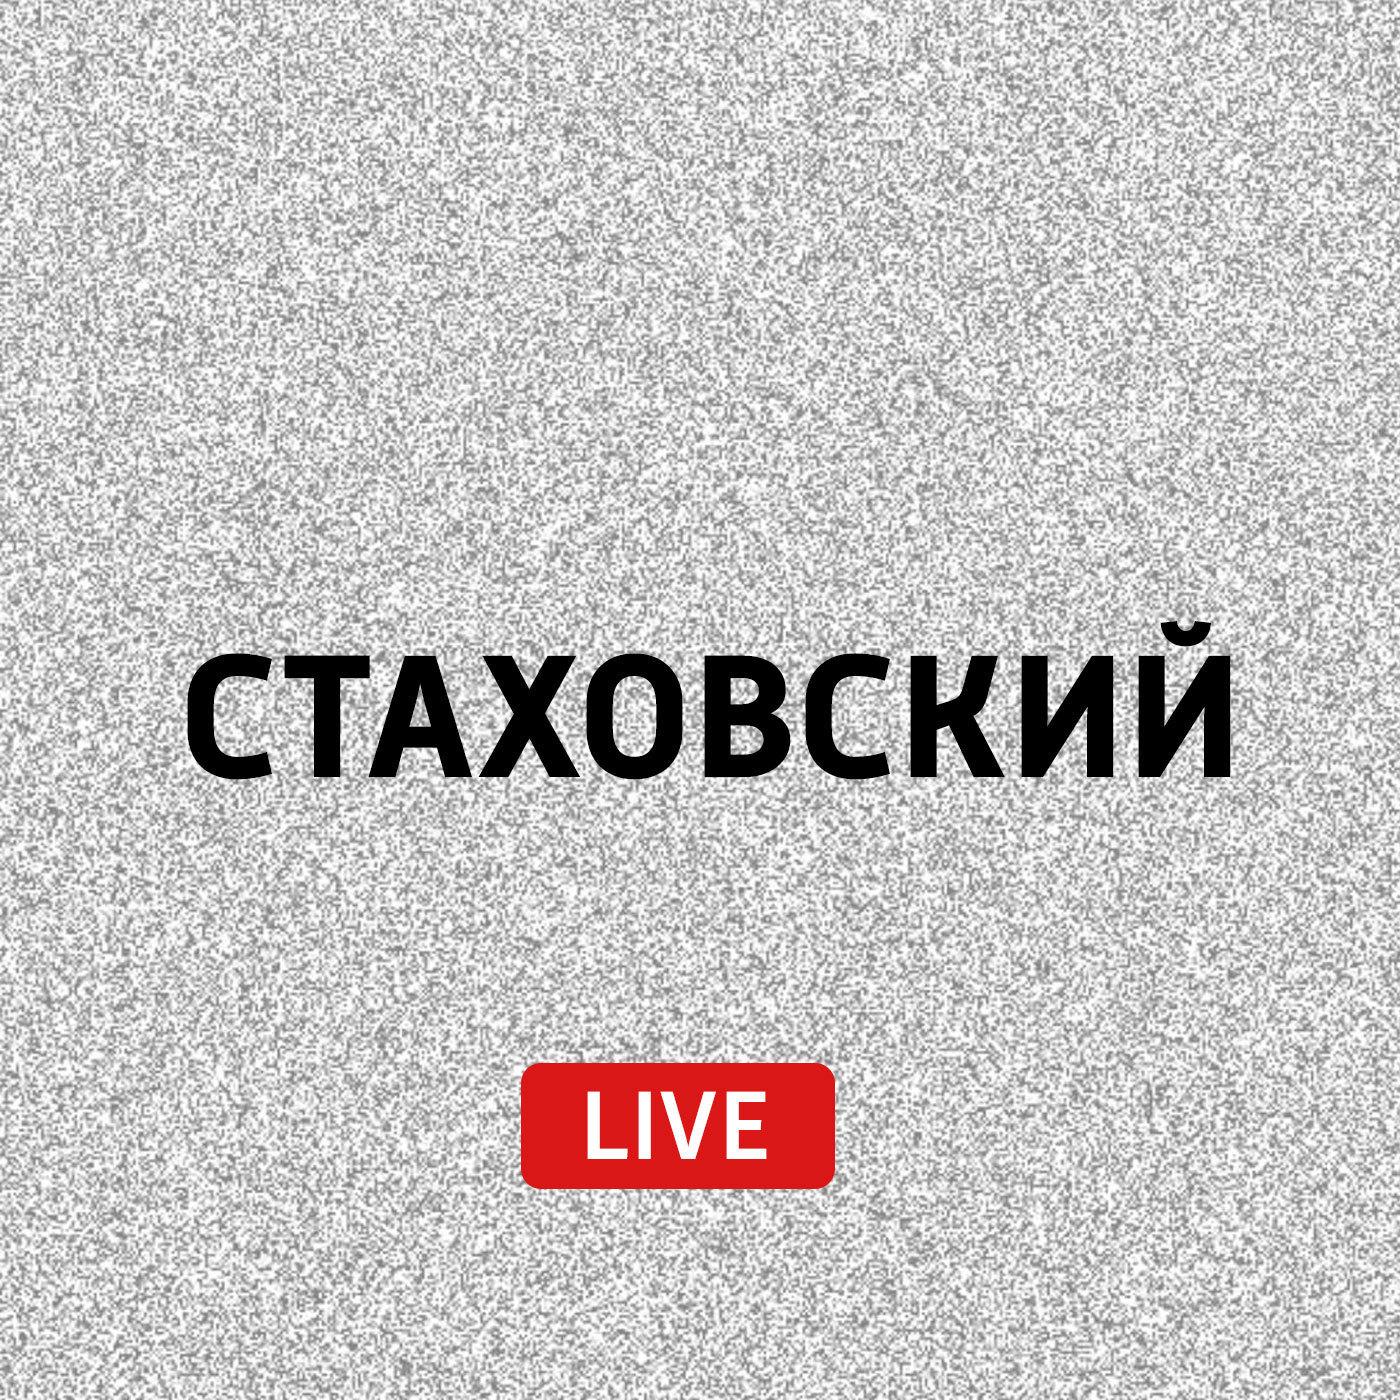 Евгений Стаховский Репост евгений стаховский этика школьников